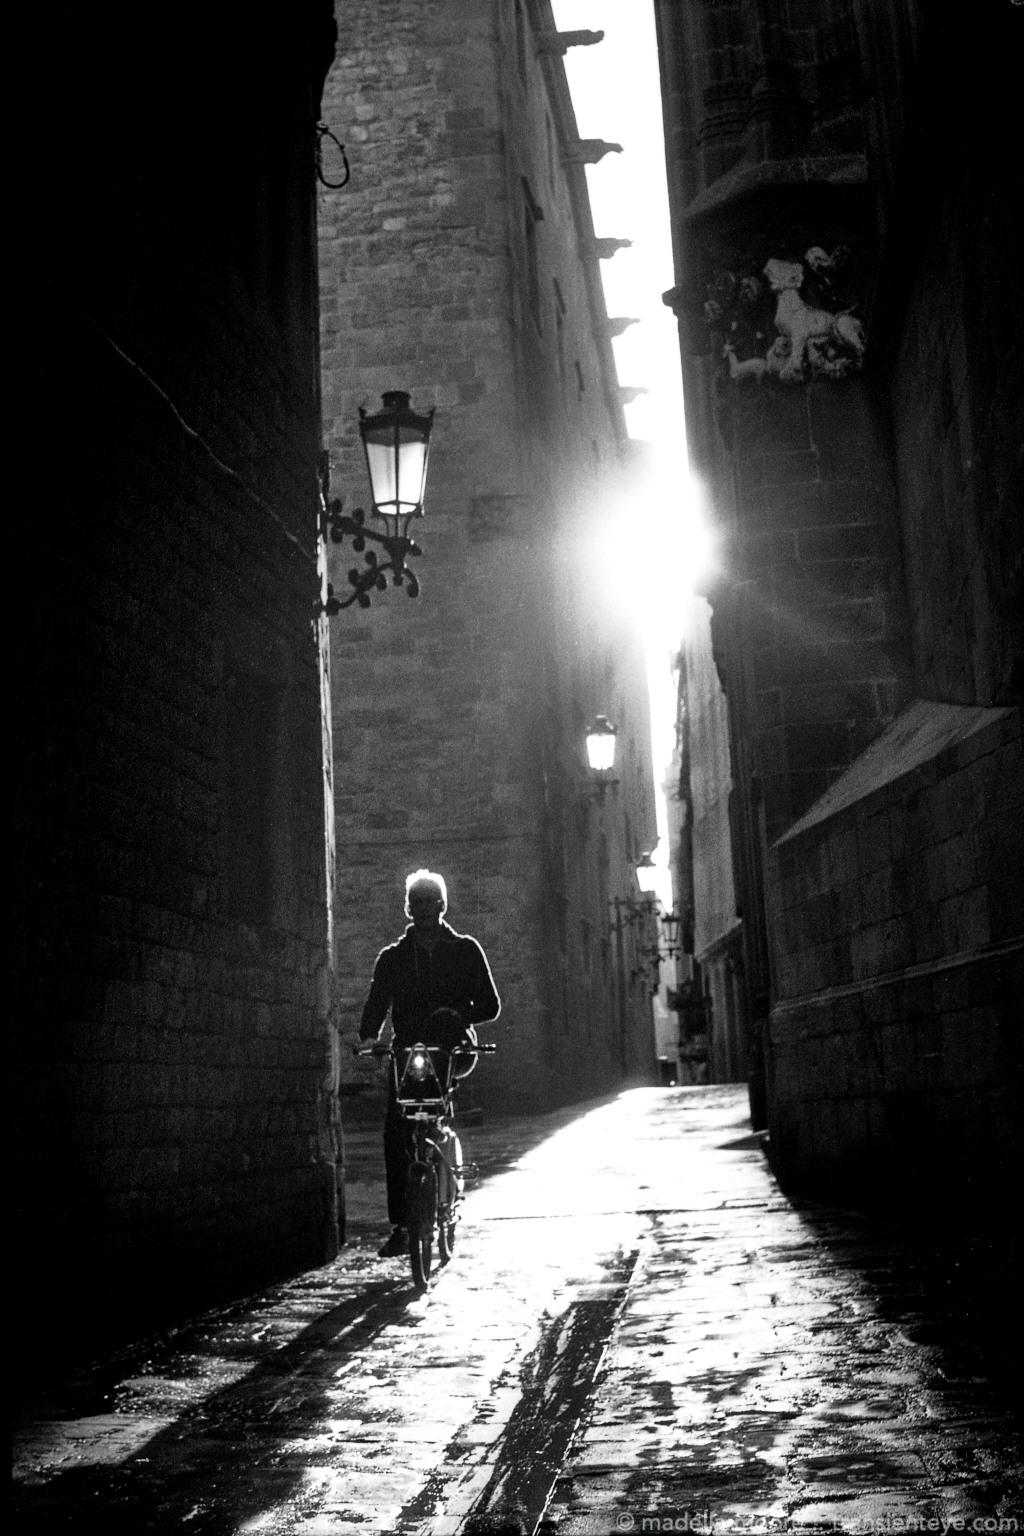 Cyclist in the Ciutat Vella, Barcelona. Shot with FED 5b on Ilford Delta 100.